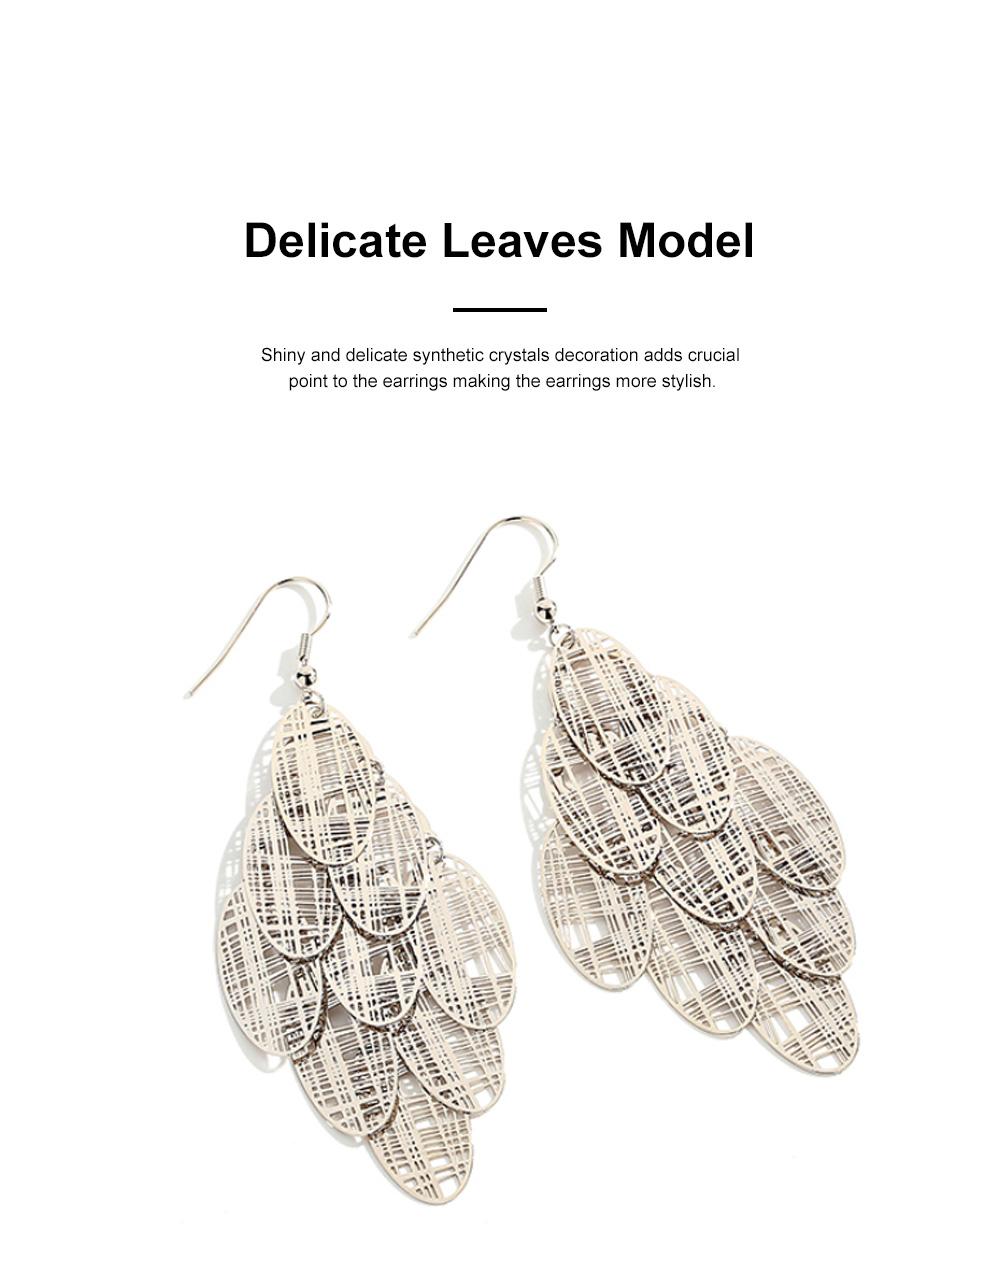 CAROMAY Stylish Elegant Vintage Delicate Hollow Leaf Model Tassels Silver Eardrops Earrings with Mirror Polishing Electroplating 3